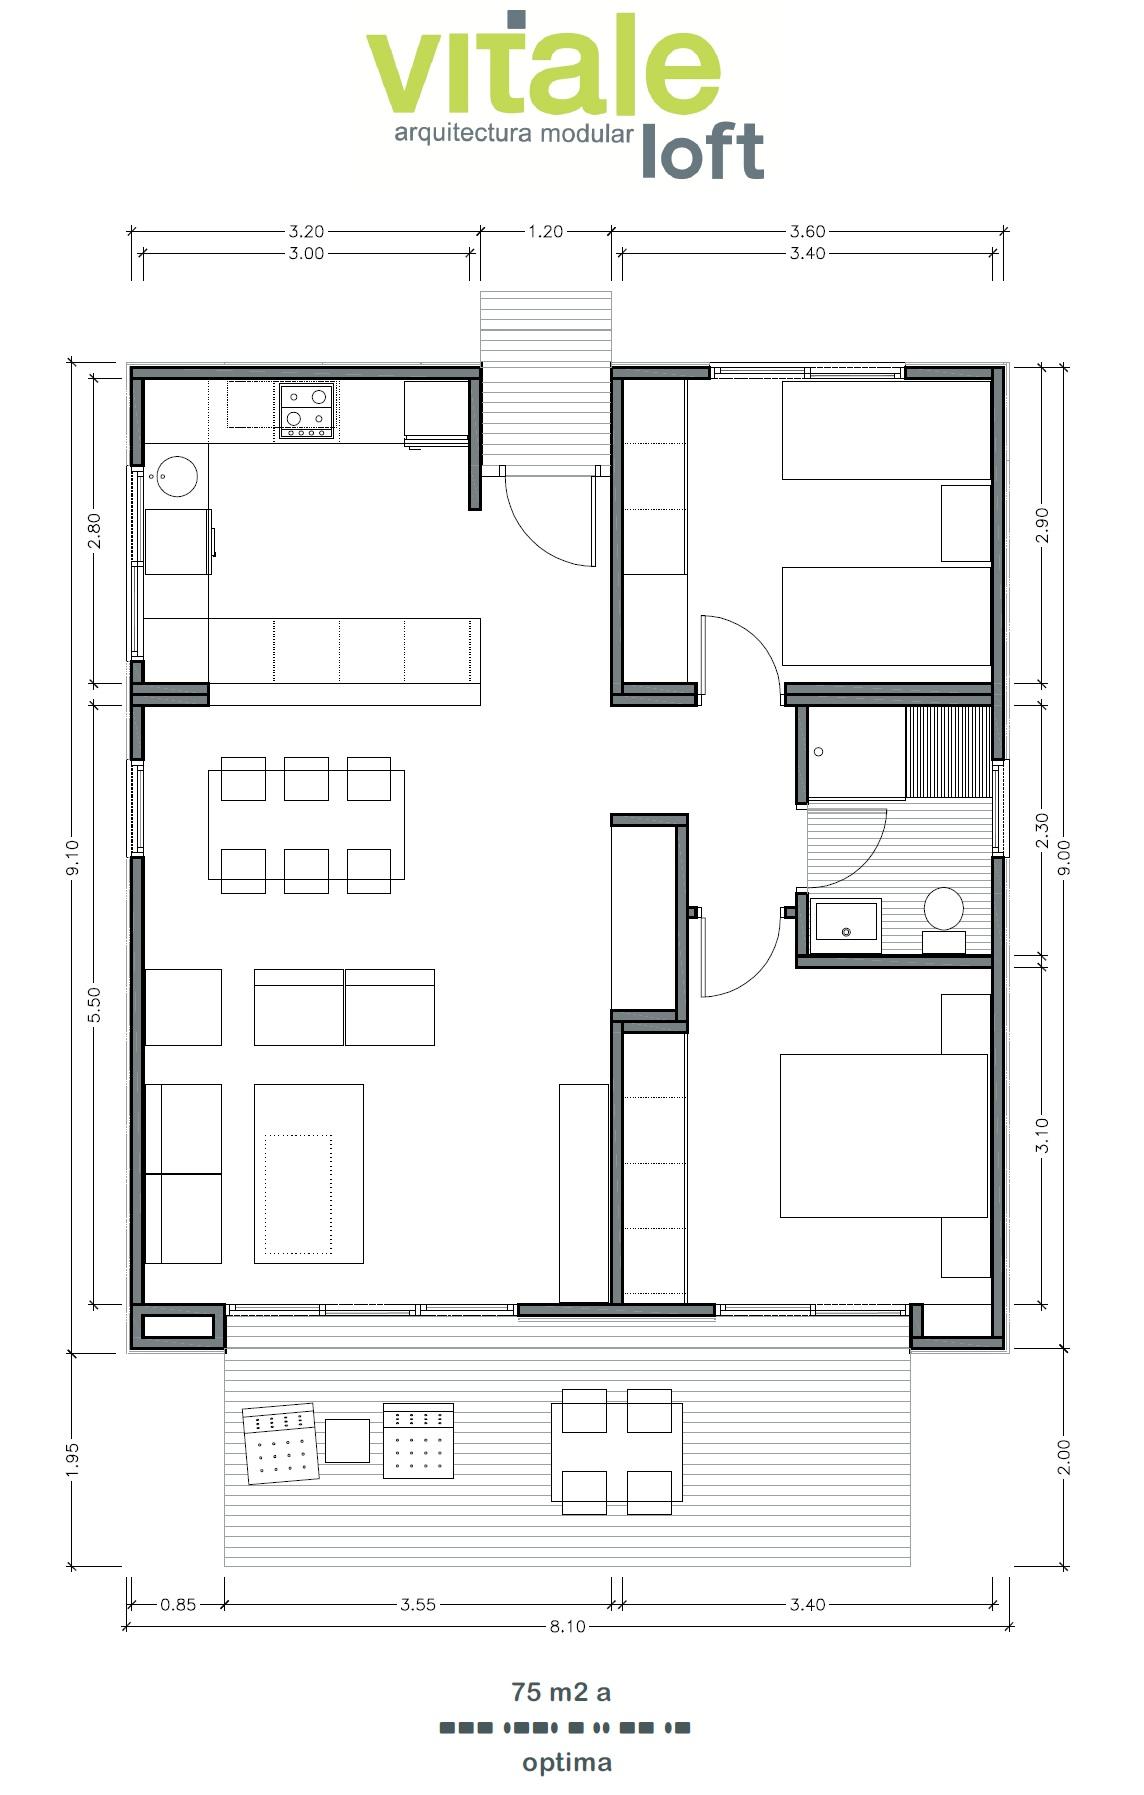 Modelo optima 75 m2 vitale loft - Planos de casas pareadas ...